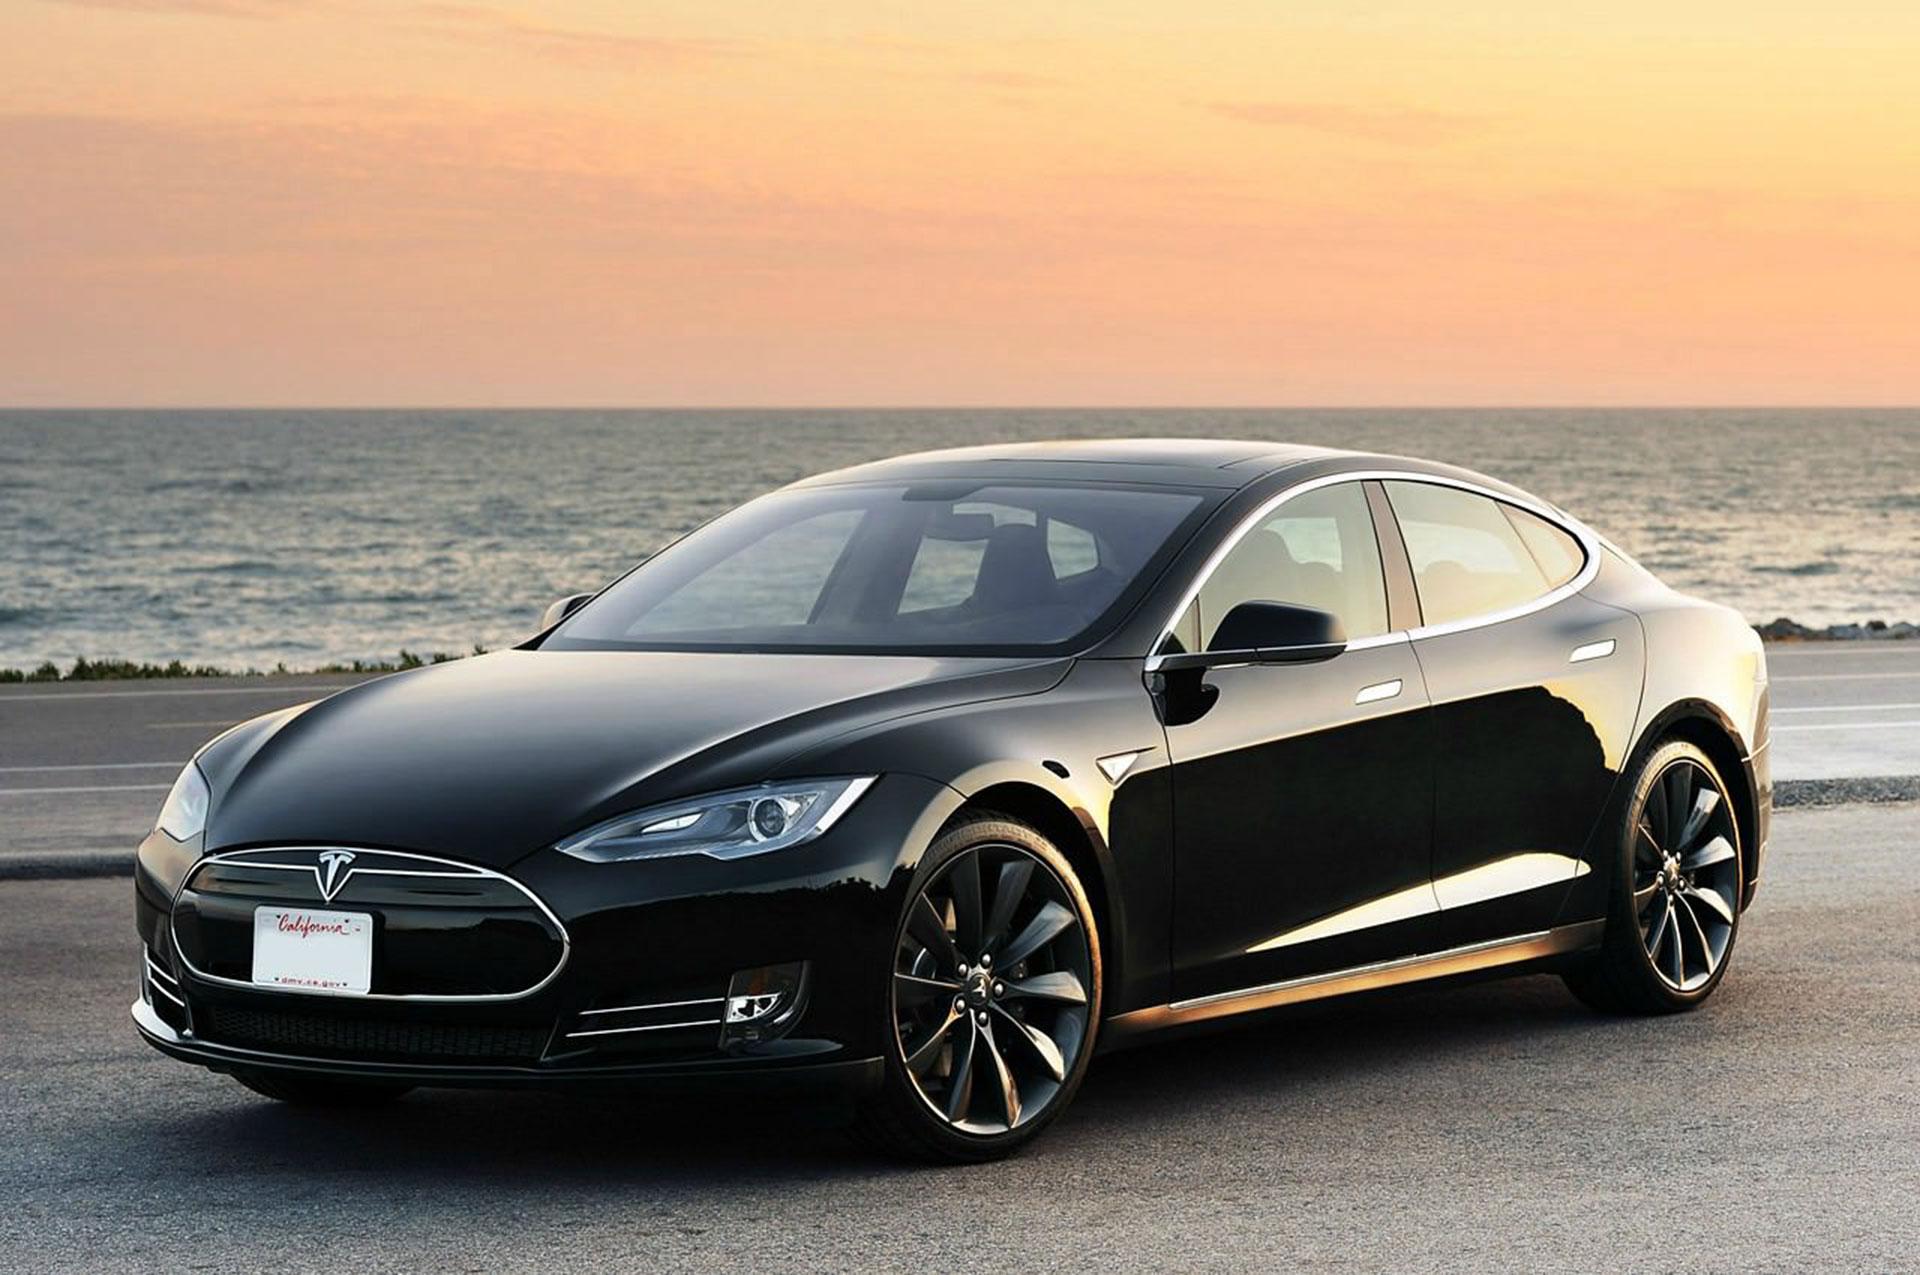 car-of-the-future